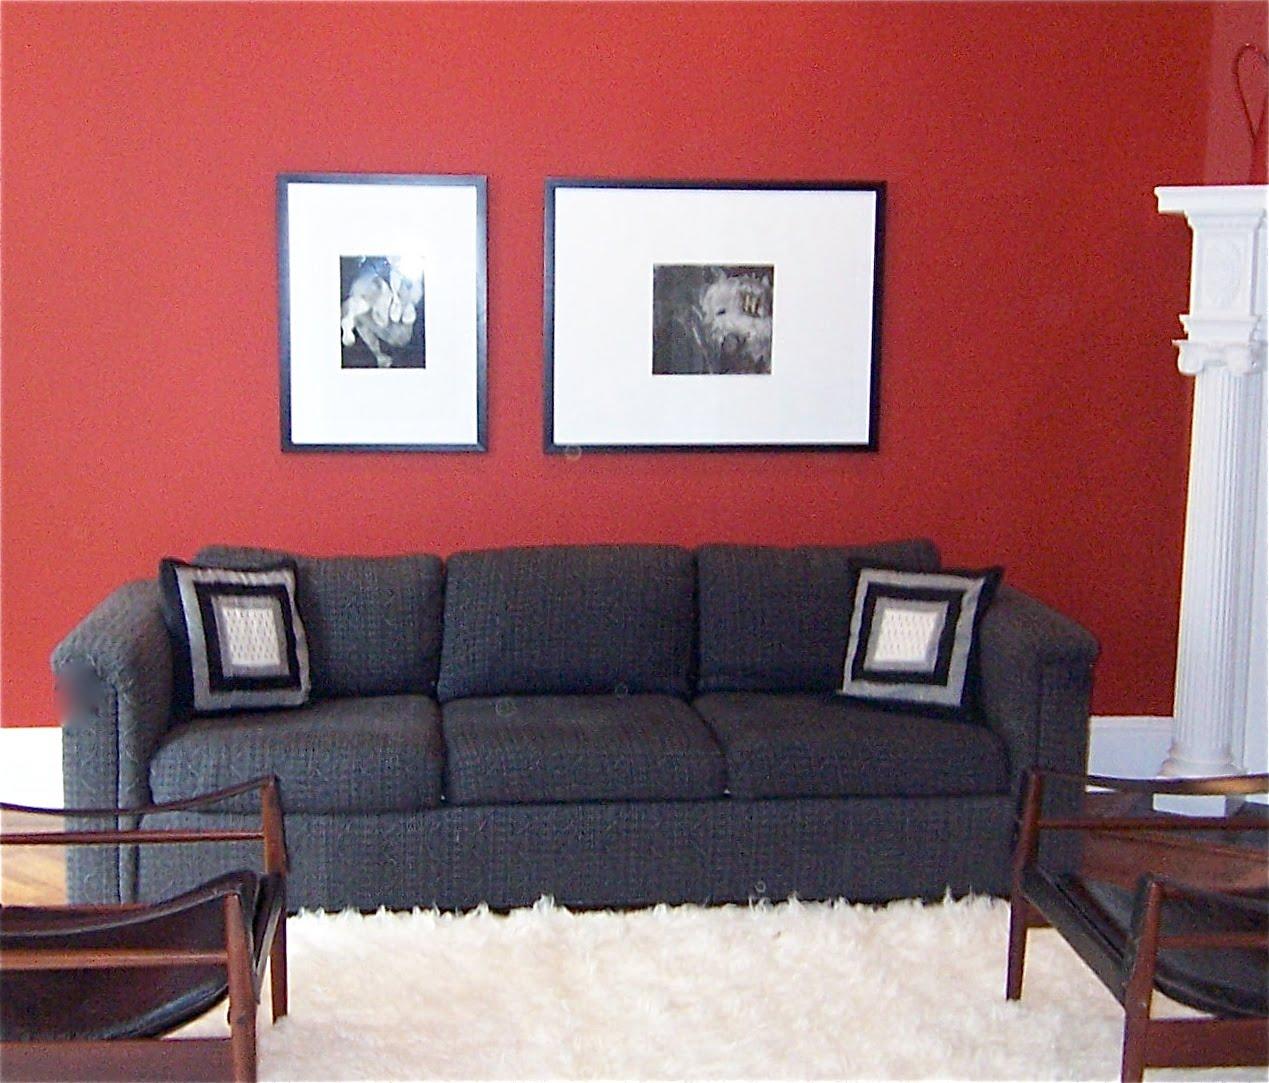 Big empty living room - Bossy Color S Living Room Part 13 That Big Huge Empty Wall Over The Sofa